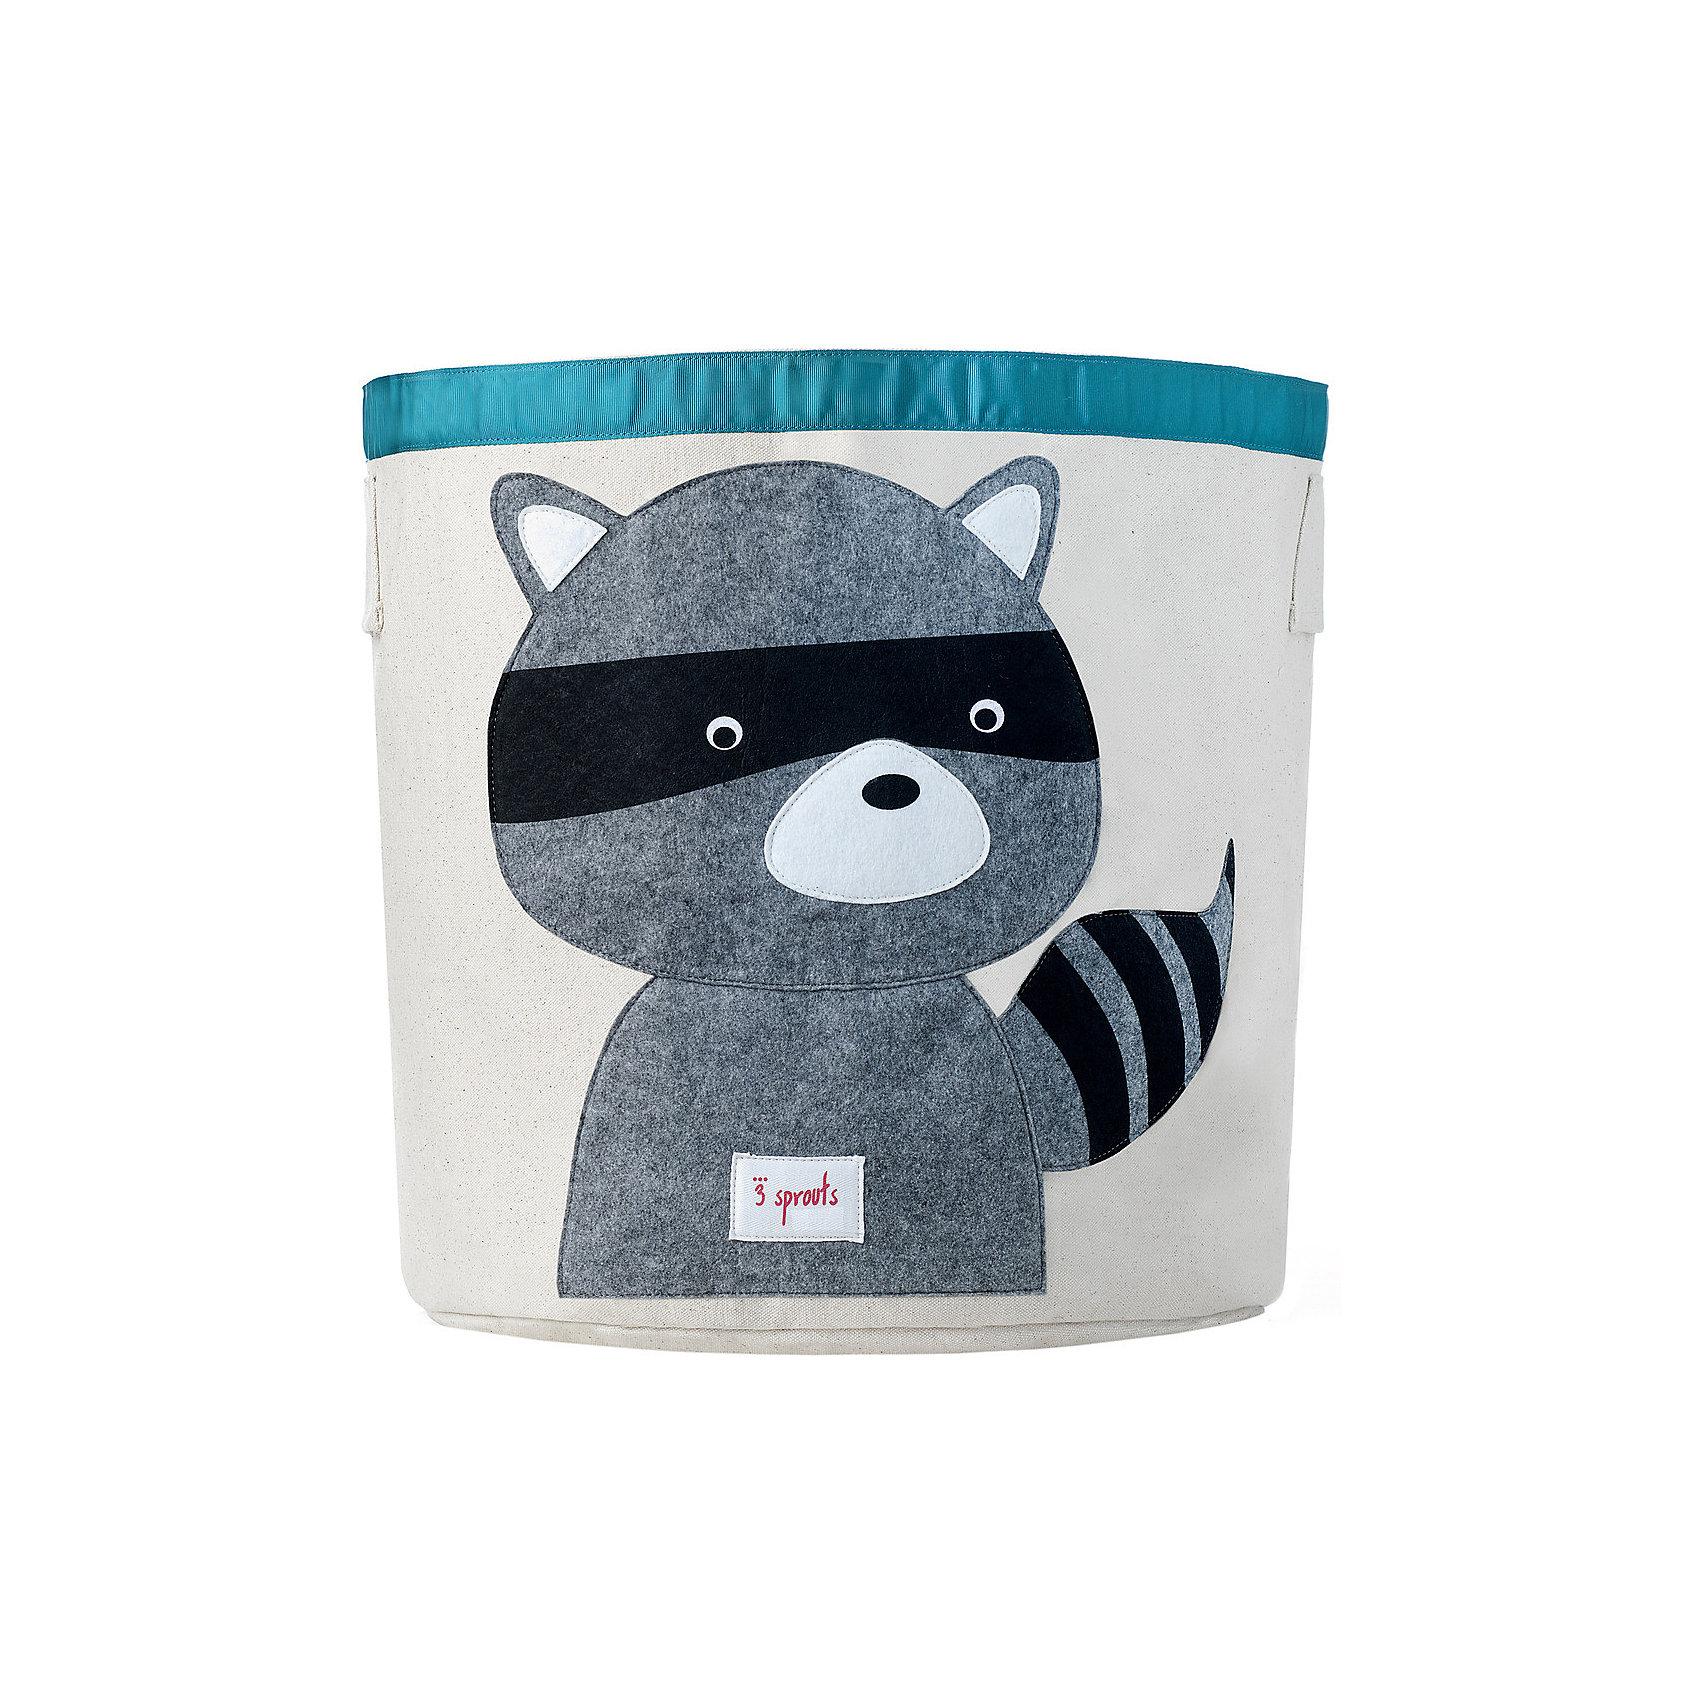 3 Sprouts Корзина для хранения Енот (Grey Raccoon), 3 Sprouts